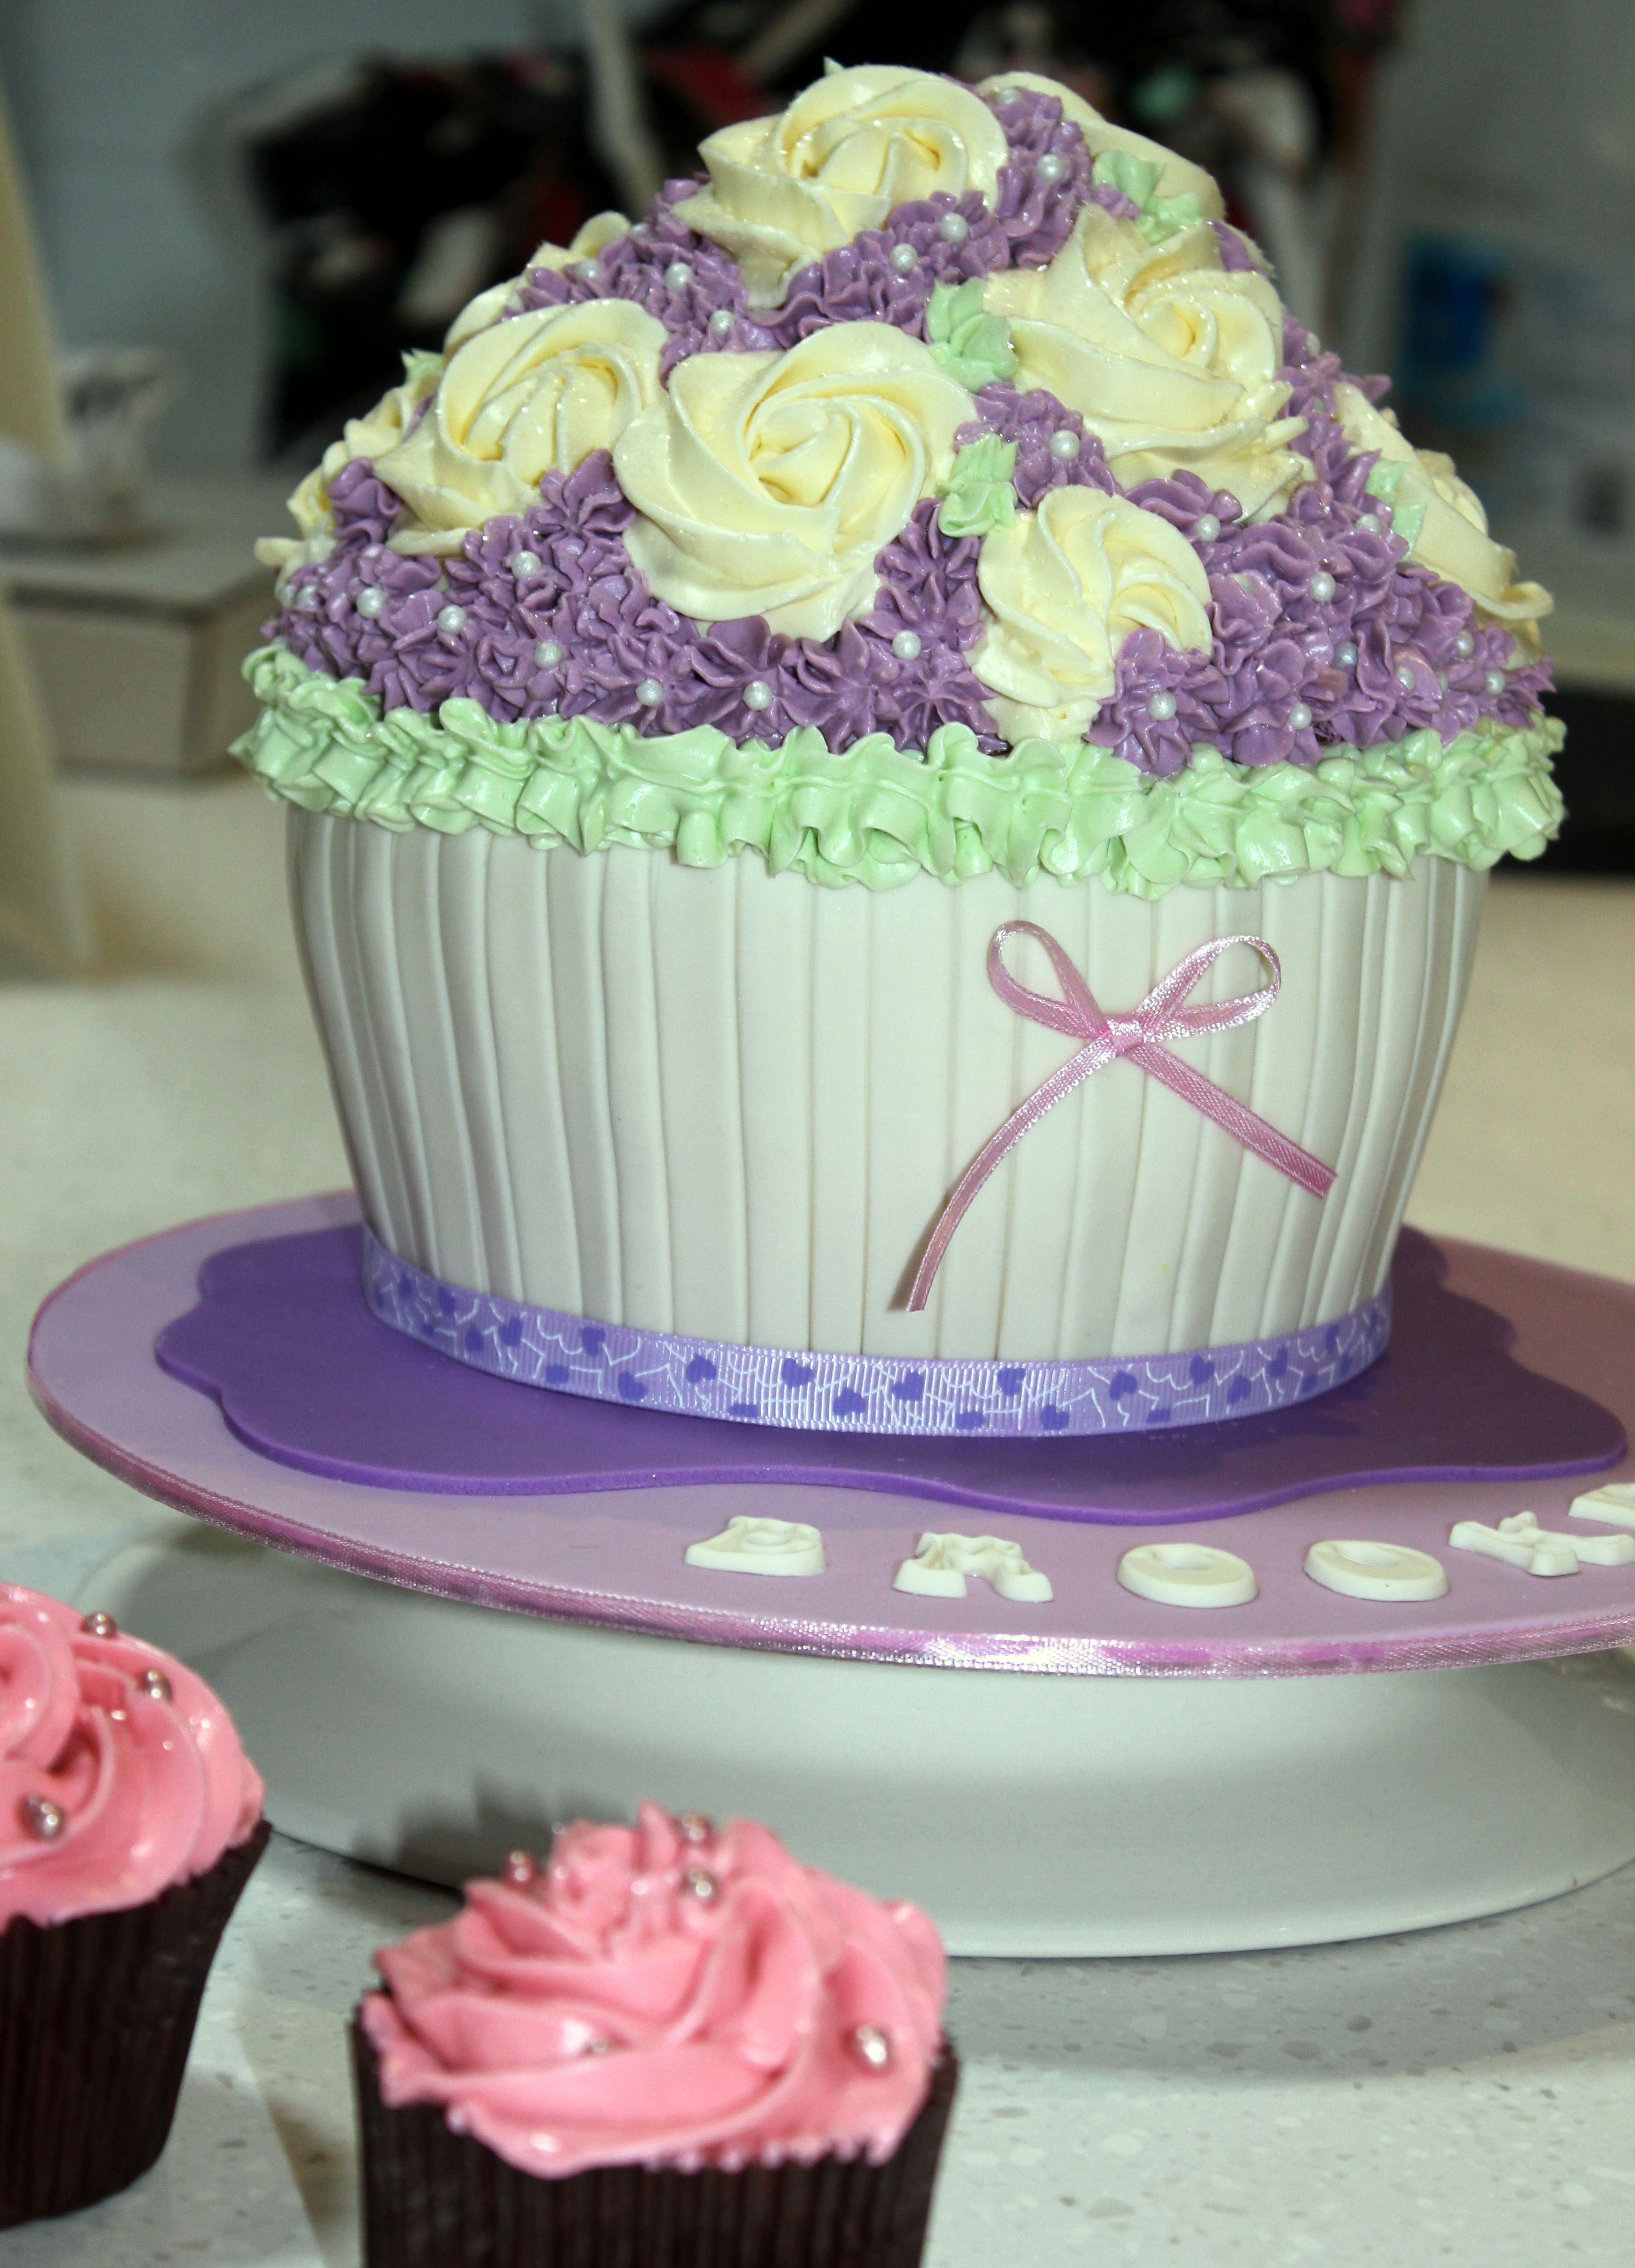 Giant Cupcake Decorating Ideas